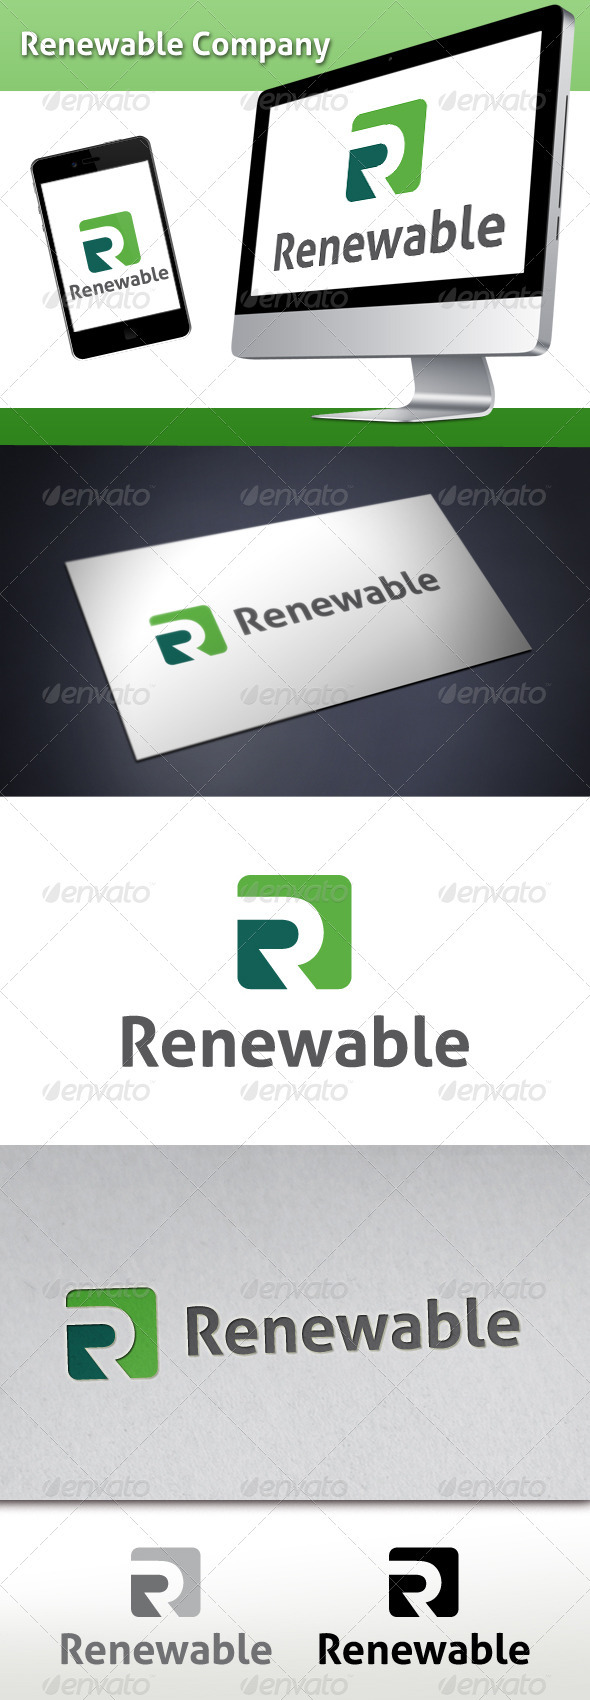 GraphicRiver Renewable Company Logo 3471862